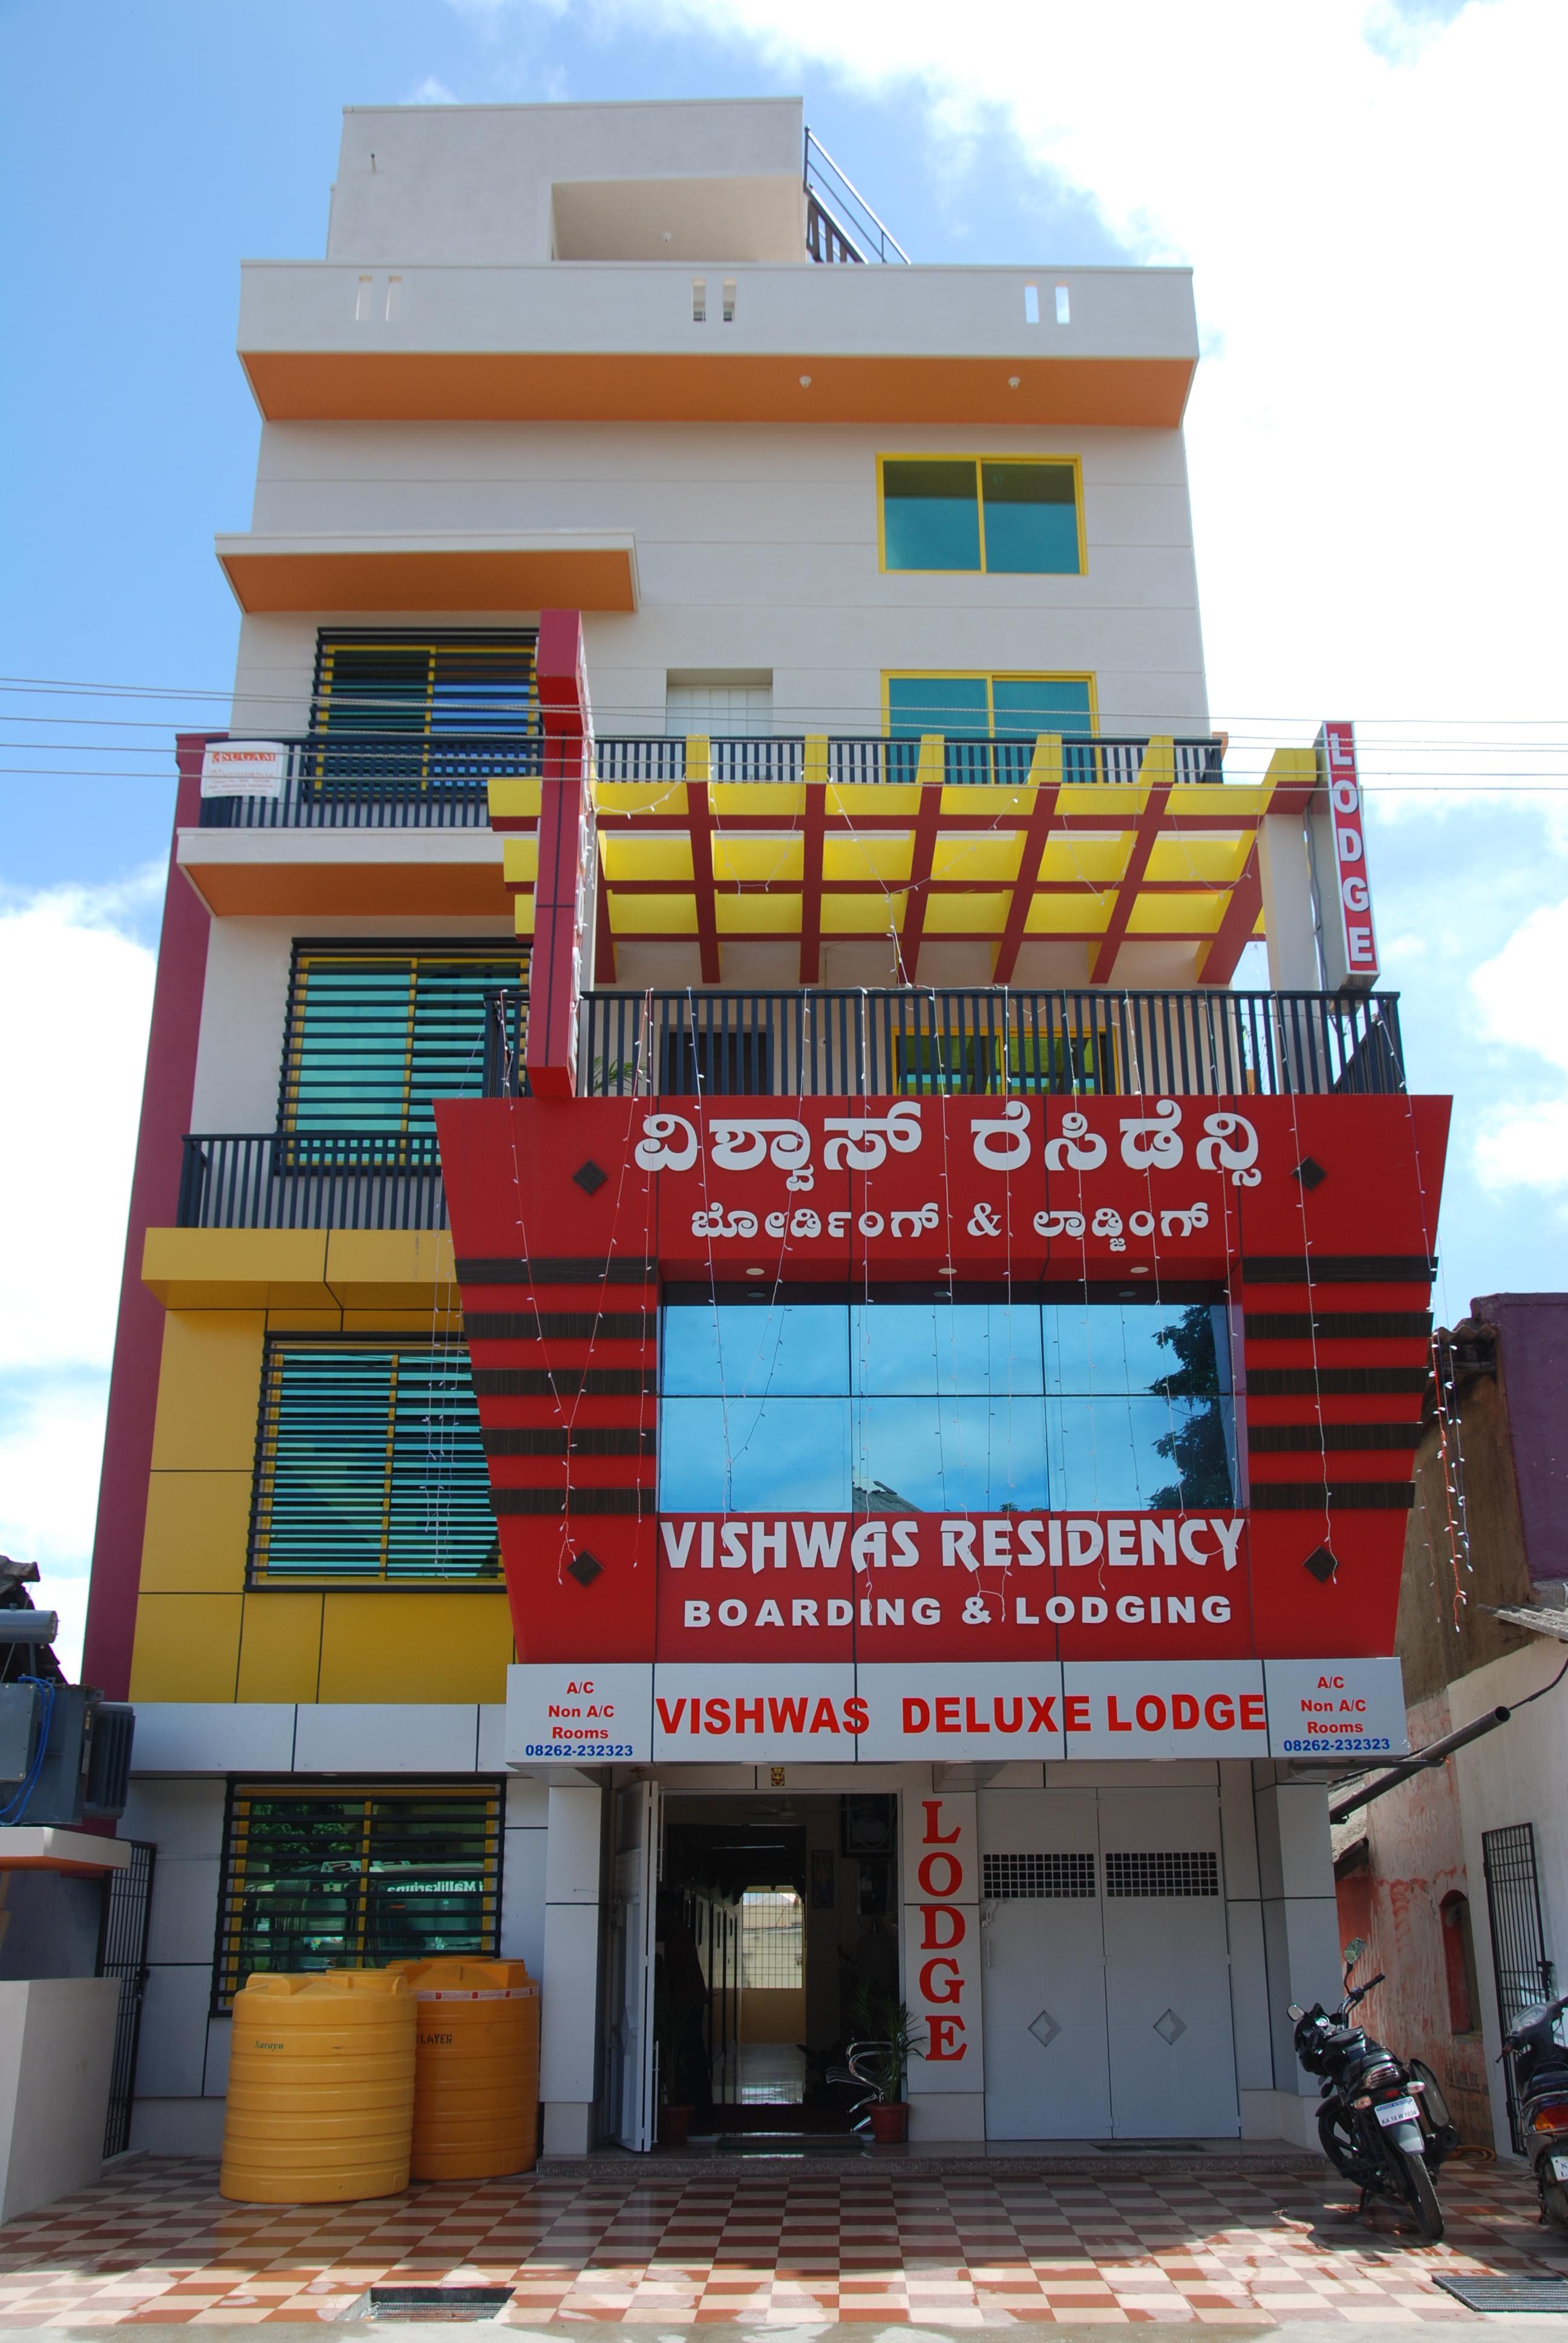 Vishwas Residency in Chikmagalur